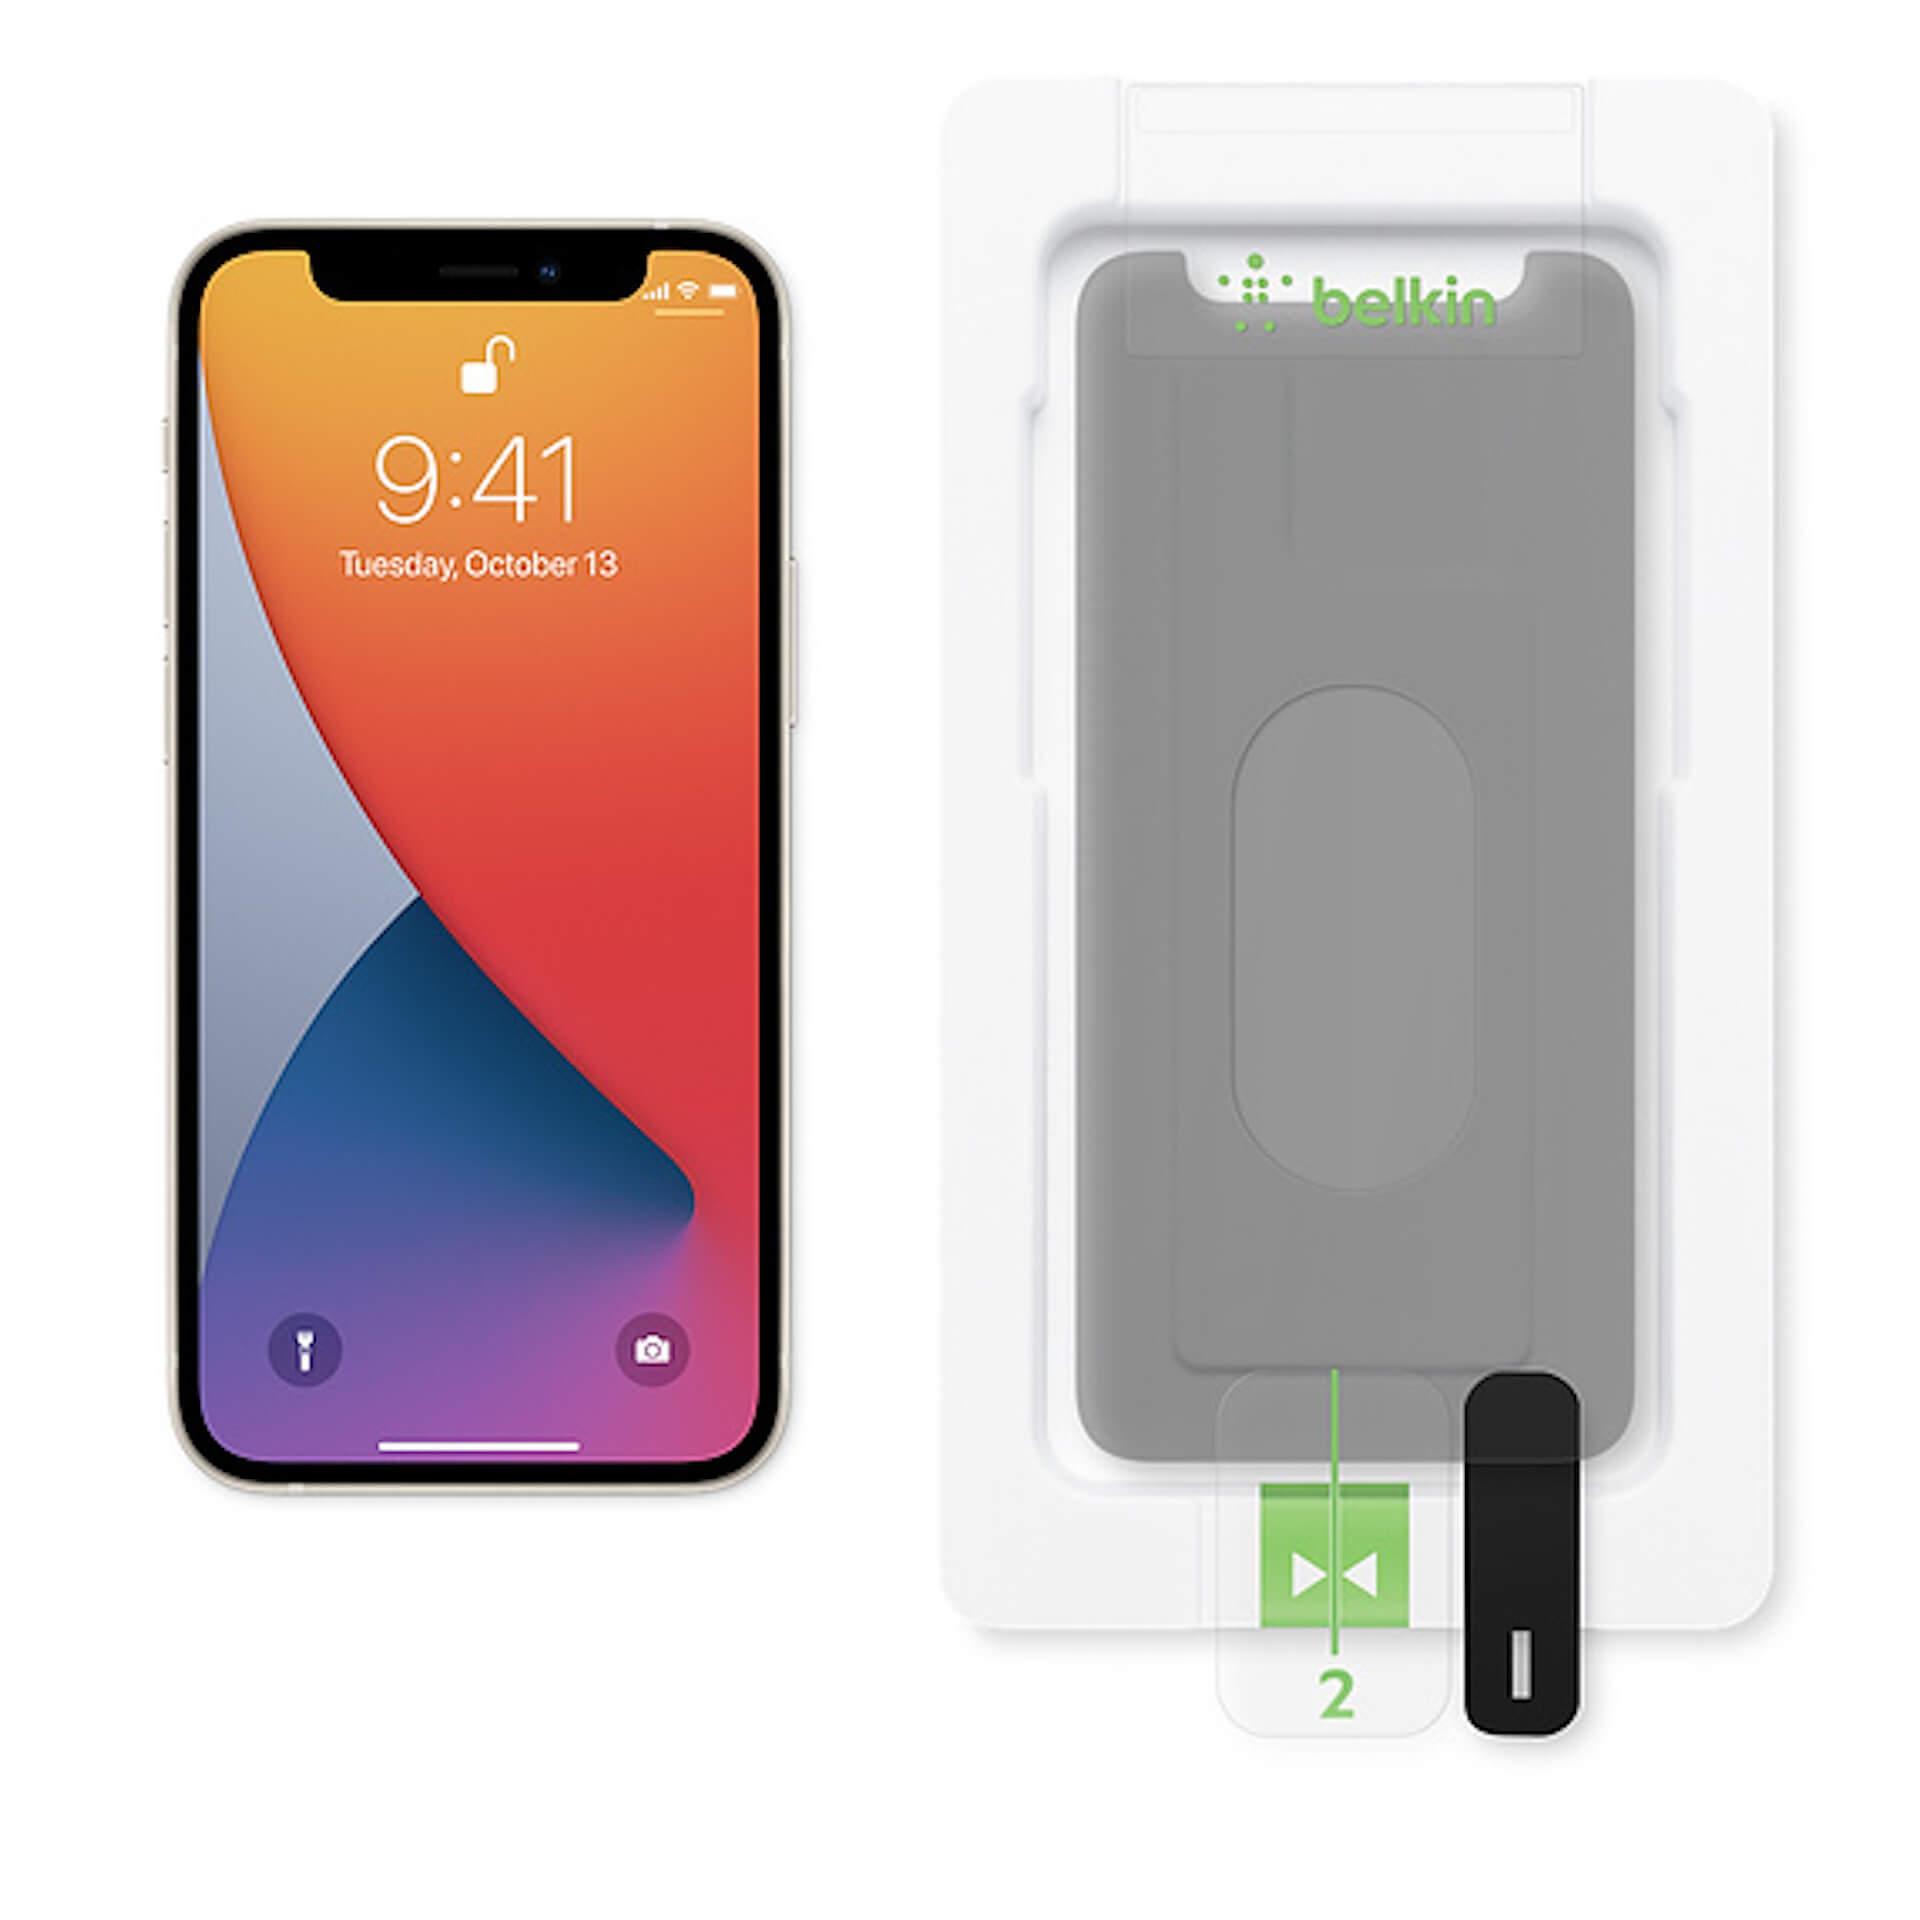 BelkinからiPhone 12シリーズに対応した高機能製品3点が発売!MagSafeを利用した3-in-1のワイヤレス充電器などが登場 tech210120_magsafe_belkin_1